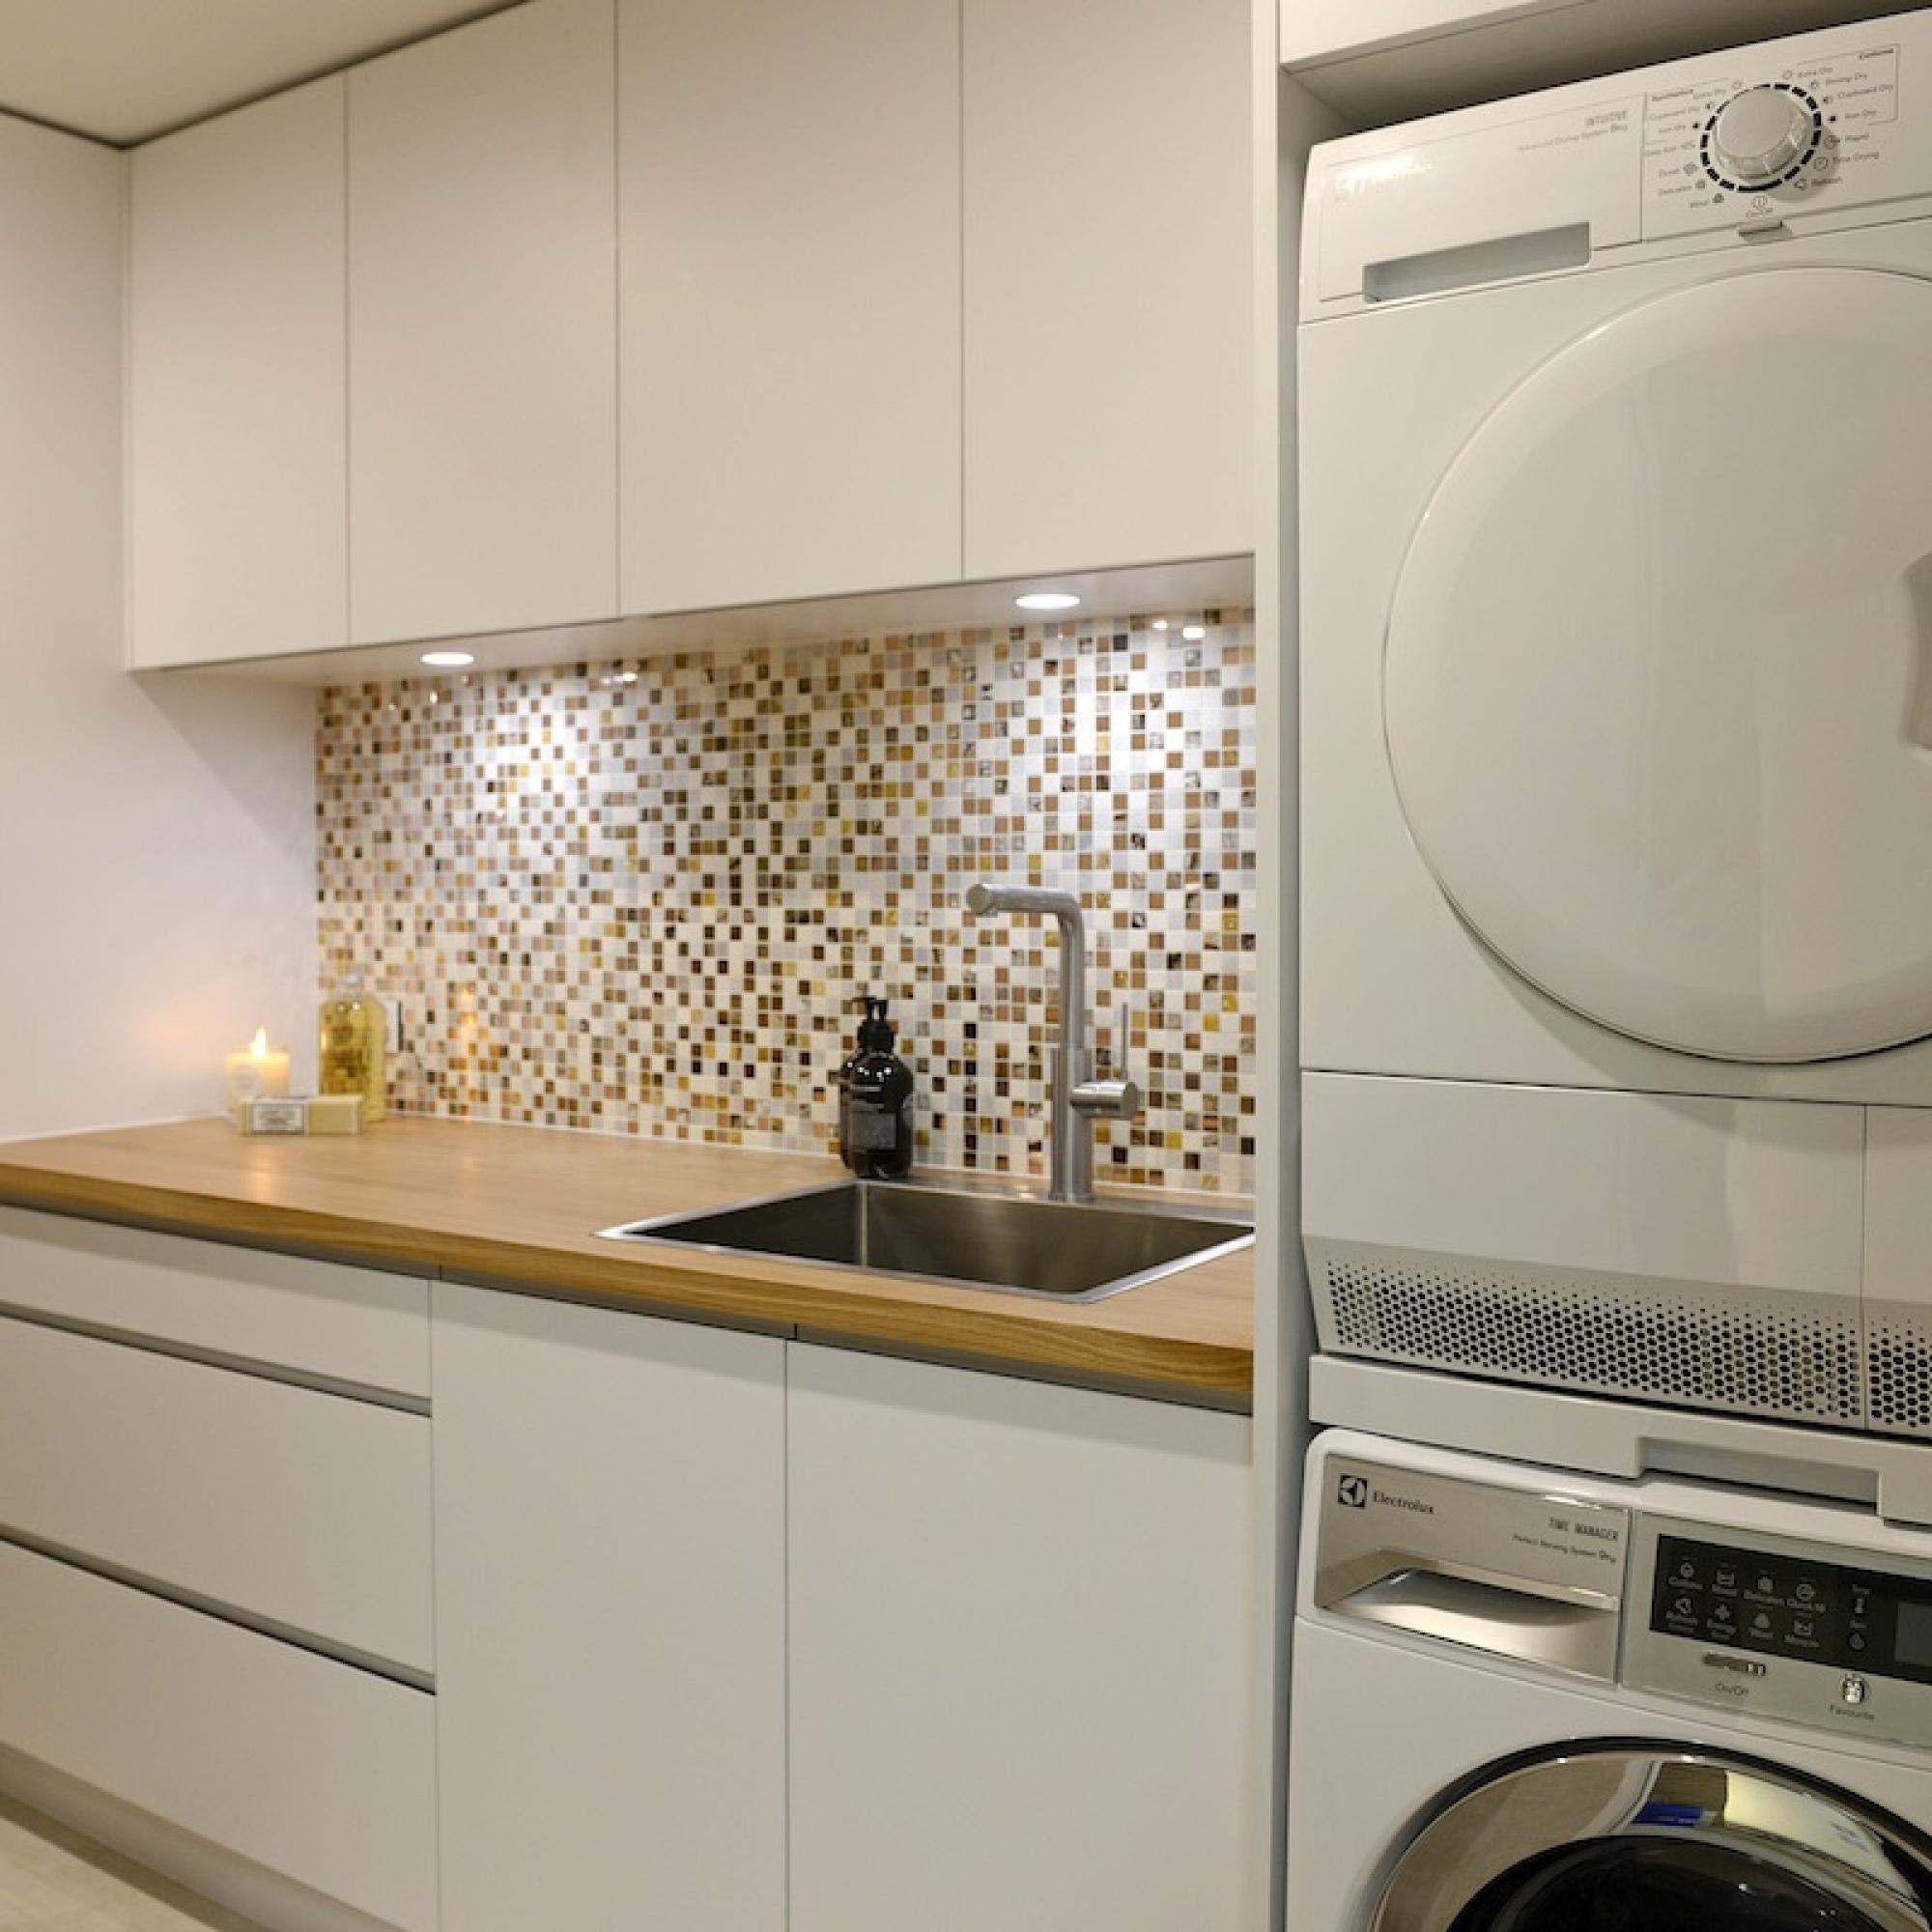 Bathroom Laundry Room Layout: Laundry And Powder Room